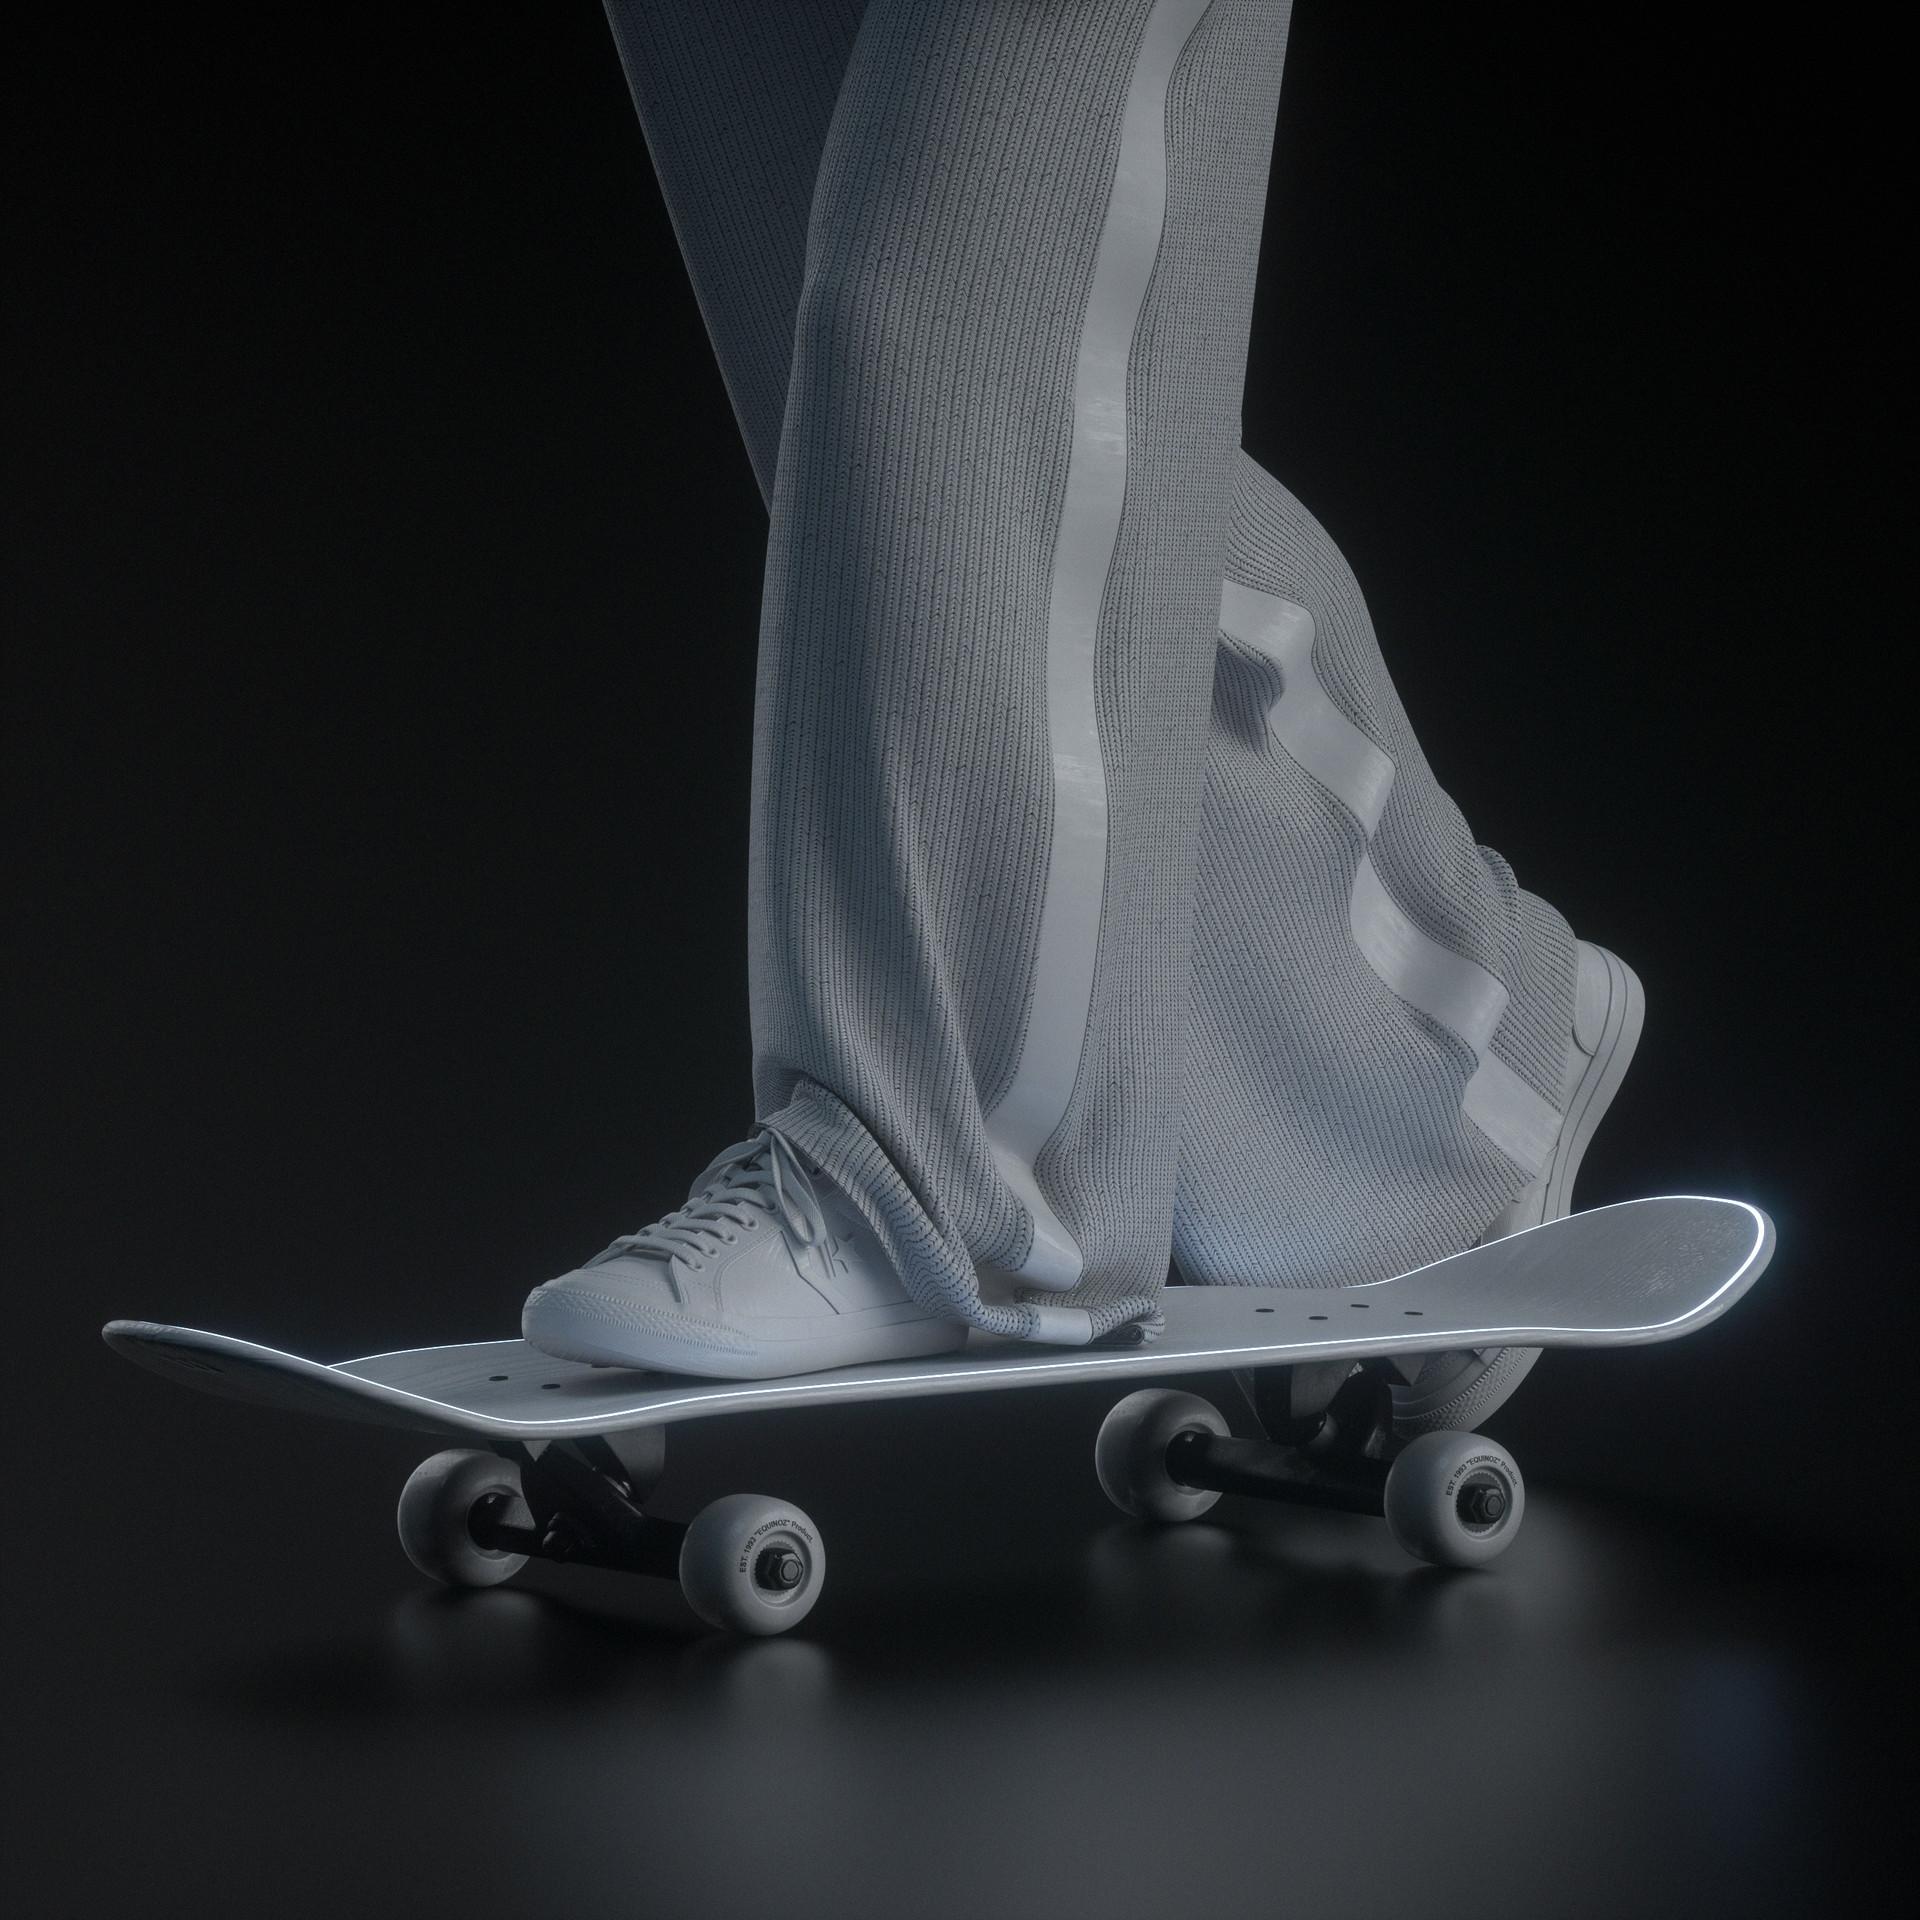 Mark chang skateboard1